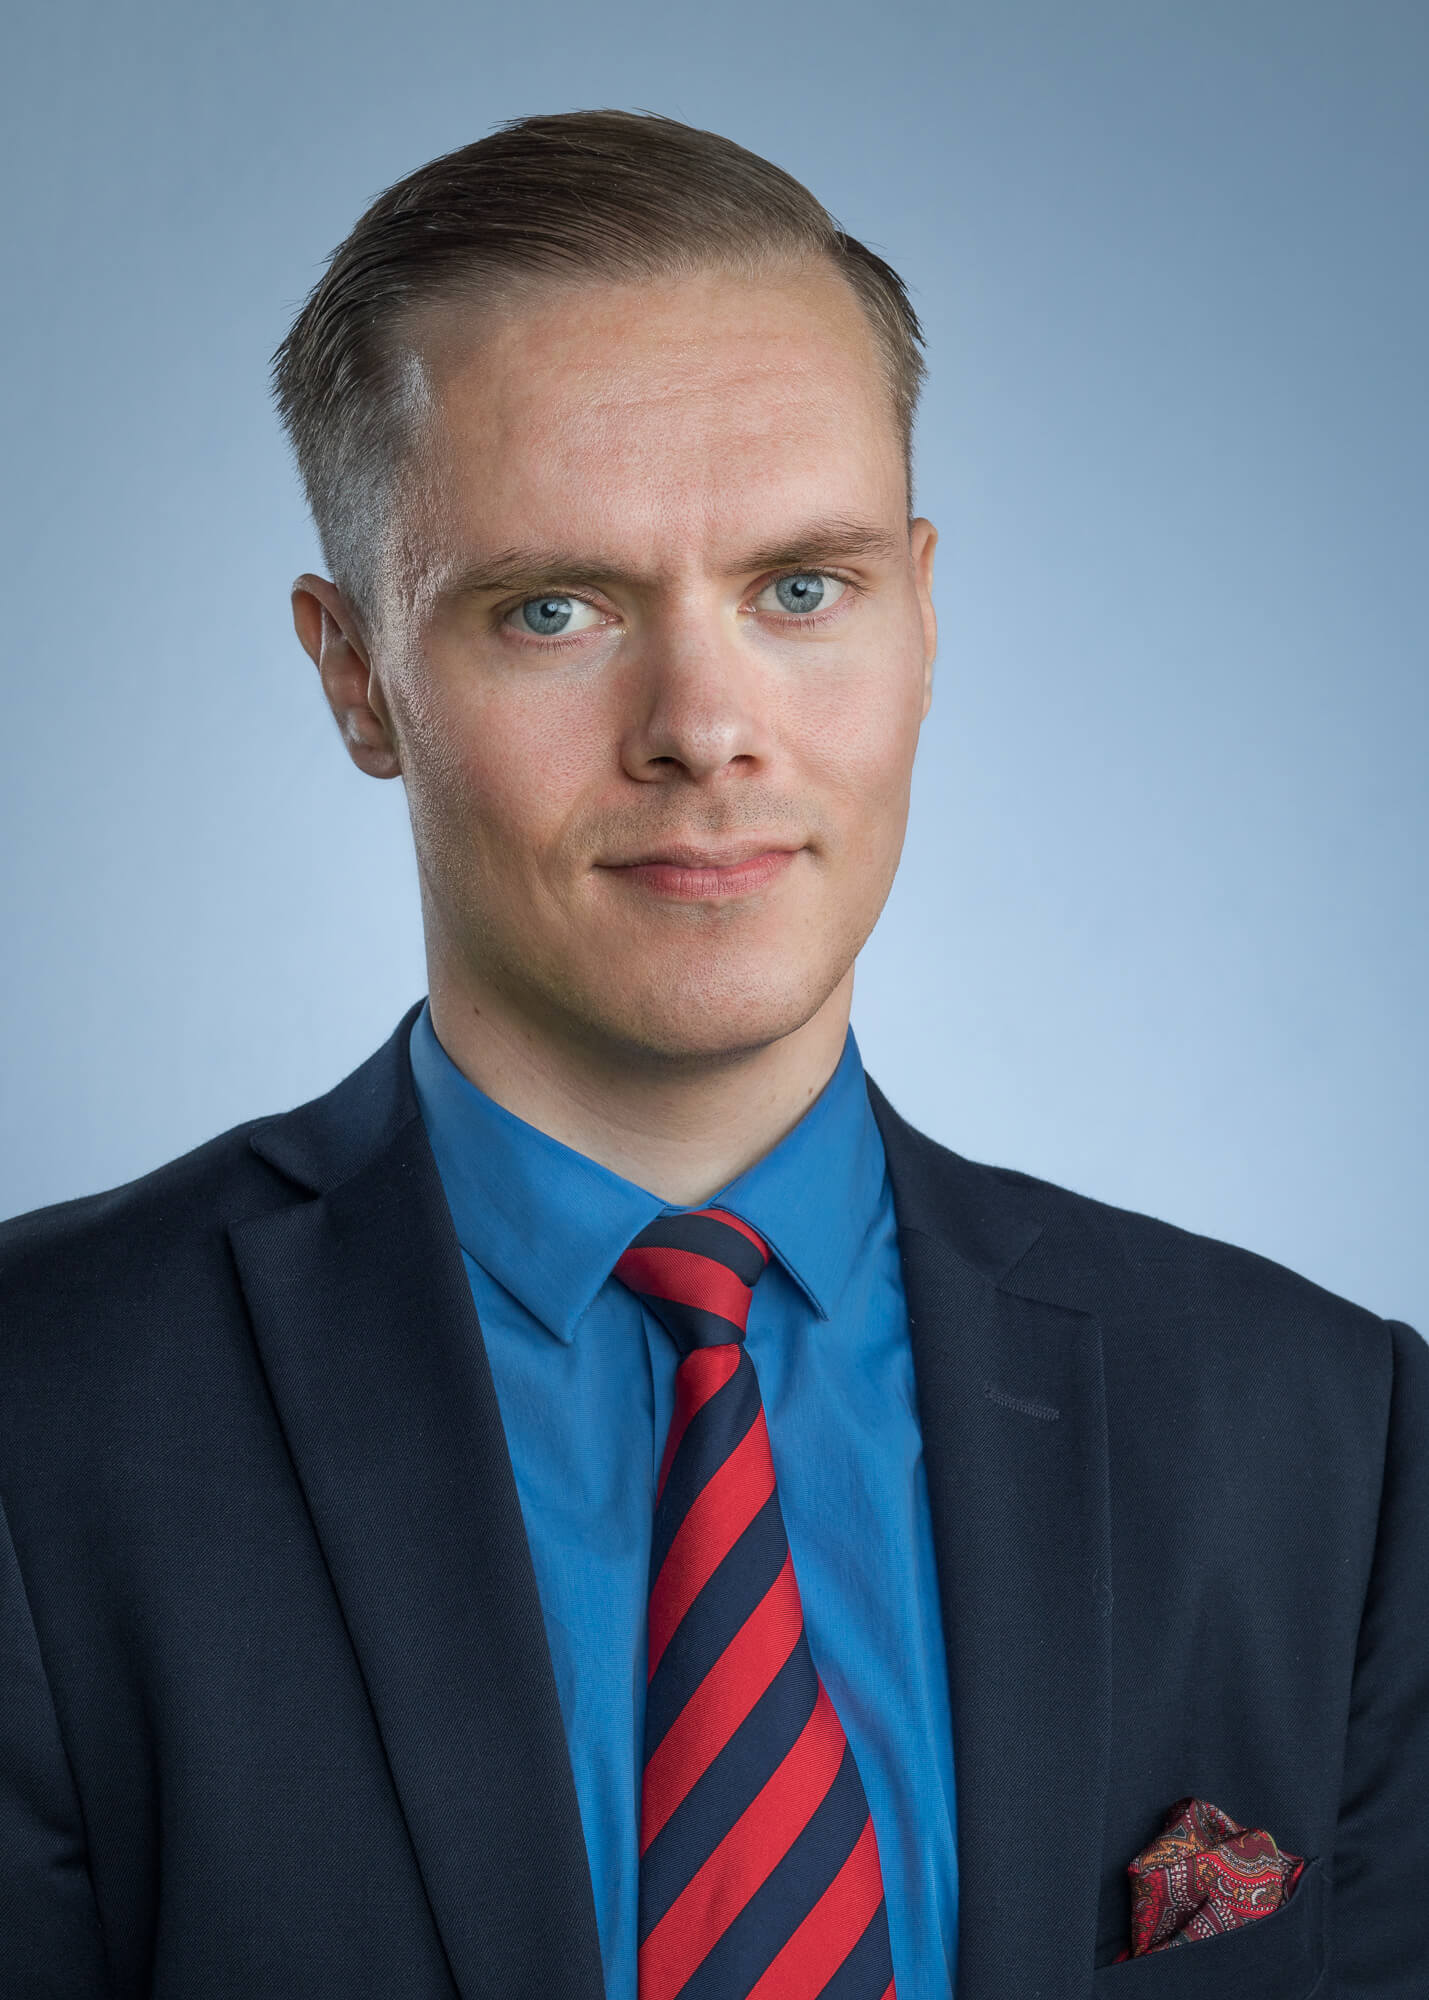 Matias Holmqvist